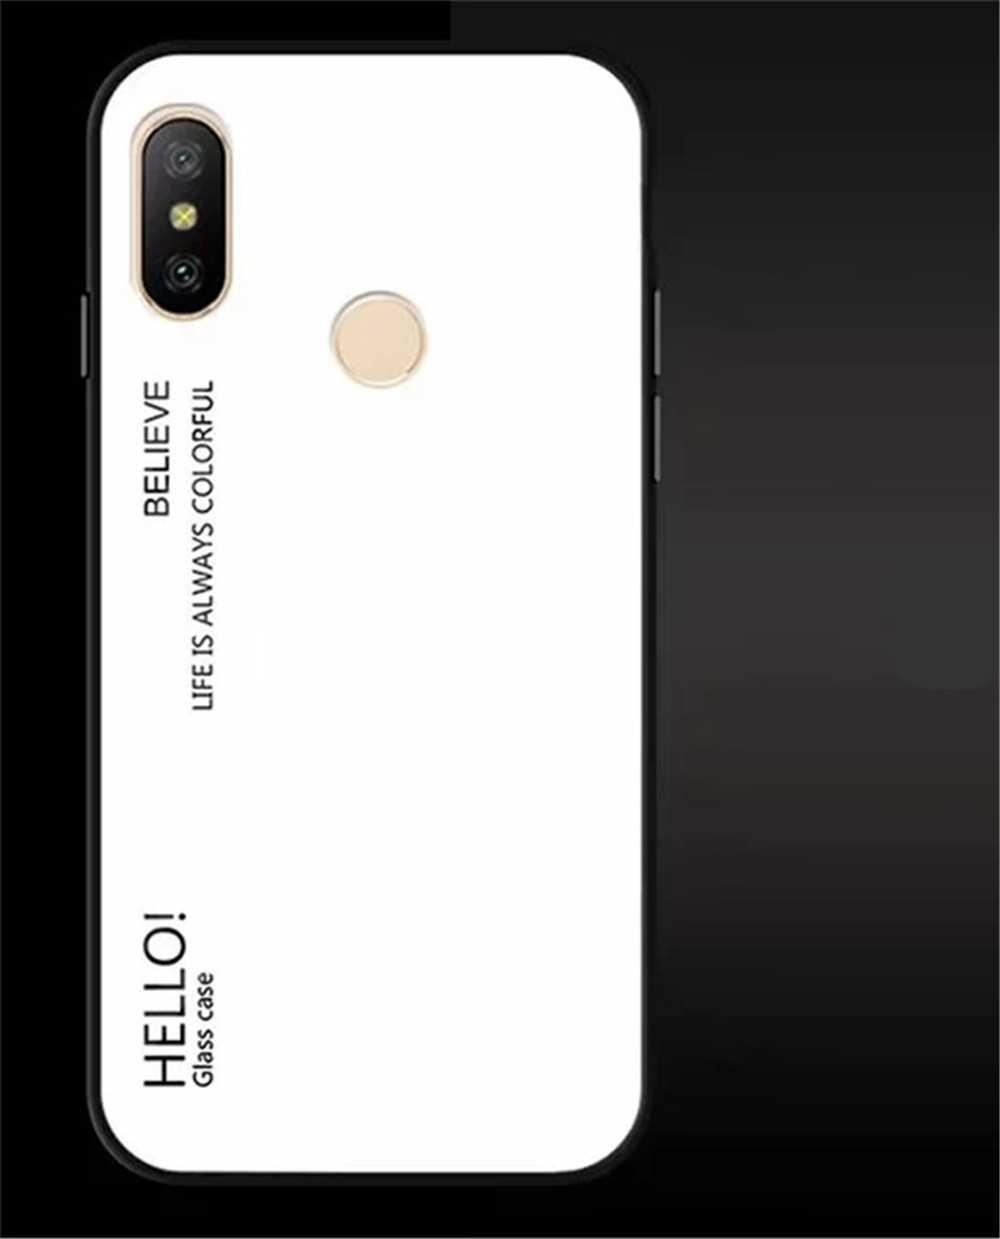 Gradient Tempered Glass Case for Redmi 6 Pro / A2 Lite